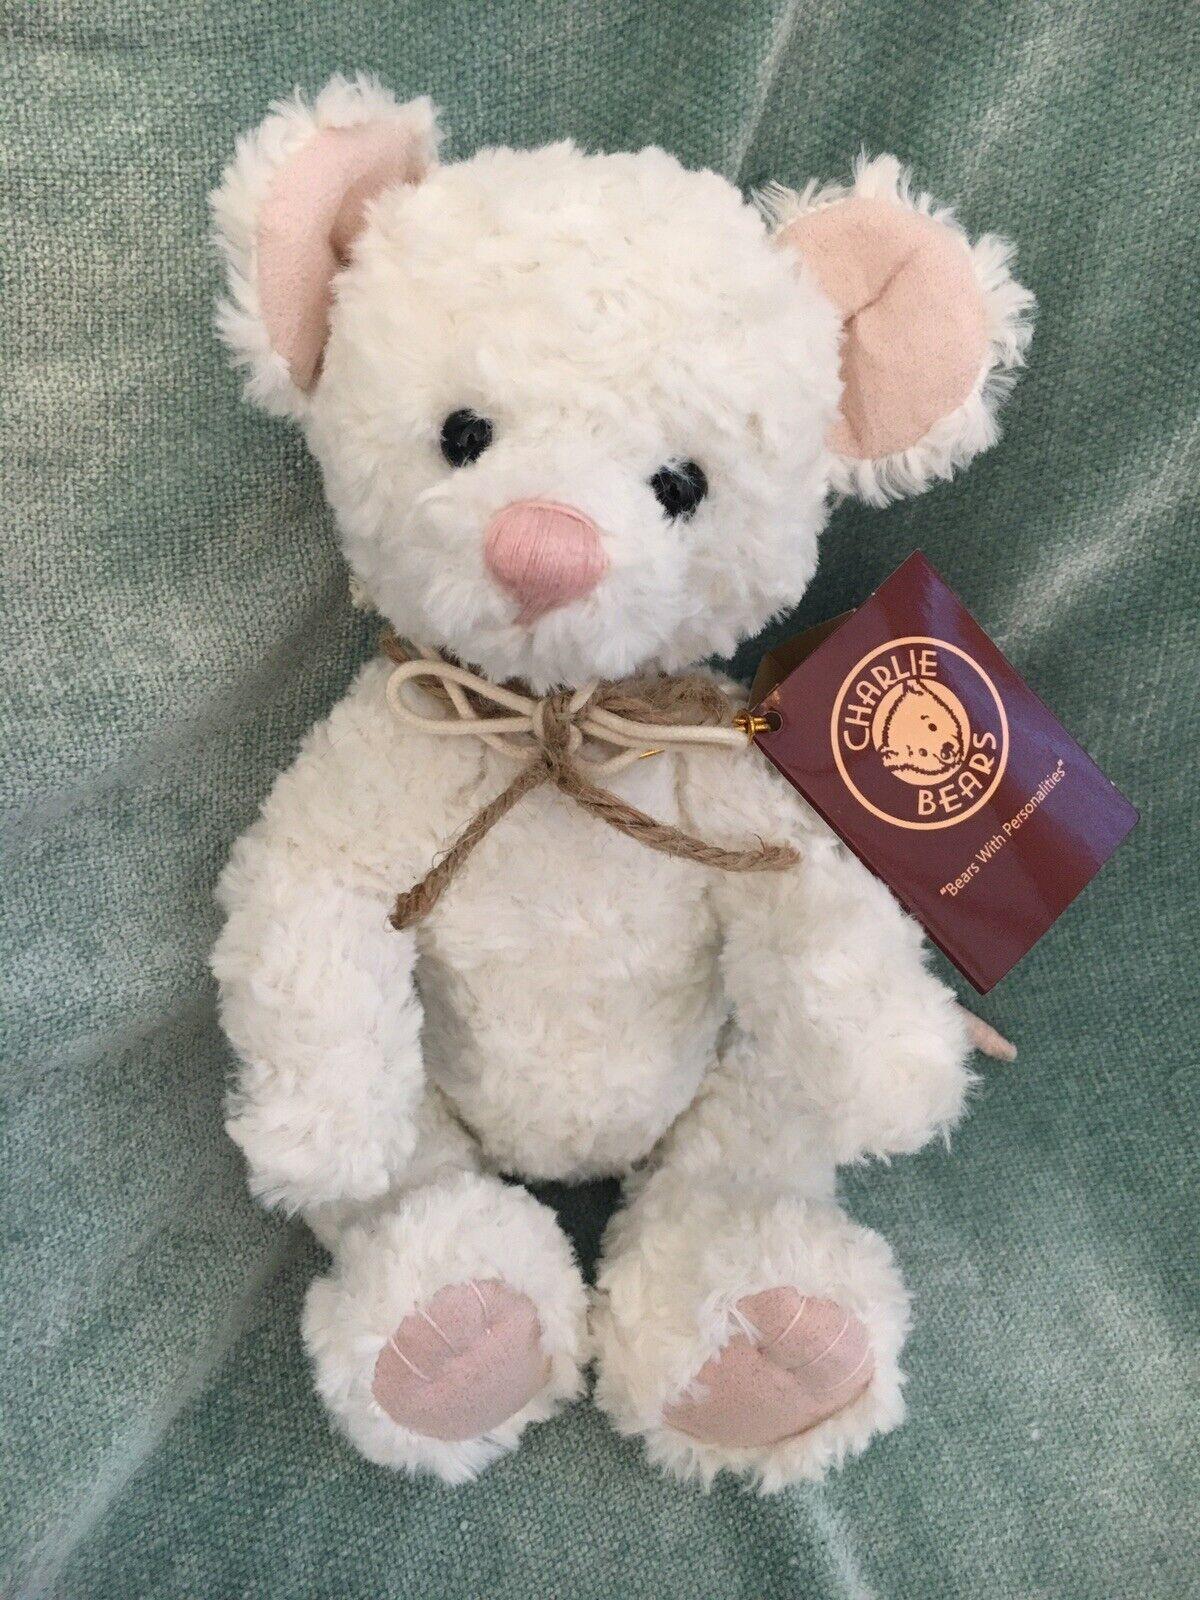 BRAND NEW CHARLIE BEAR WITH GIFT BAG - PEEPS